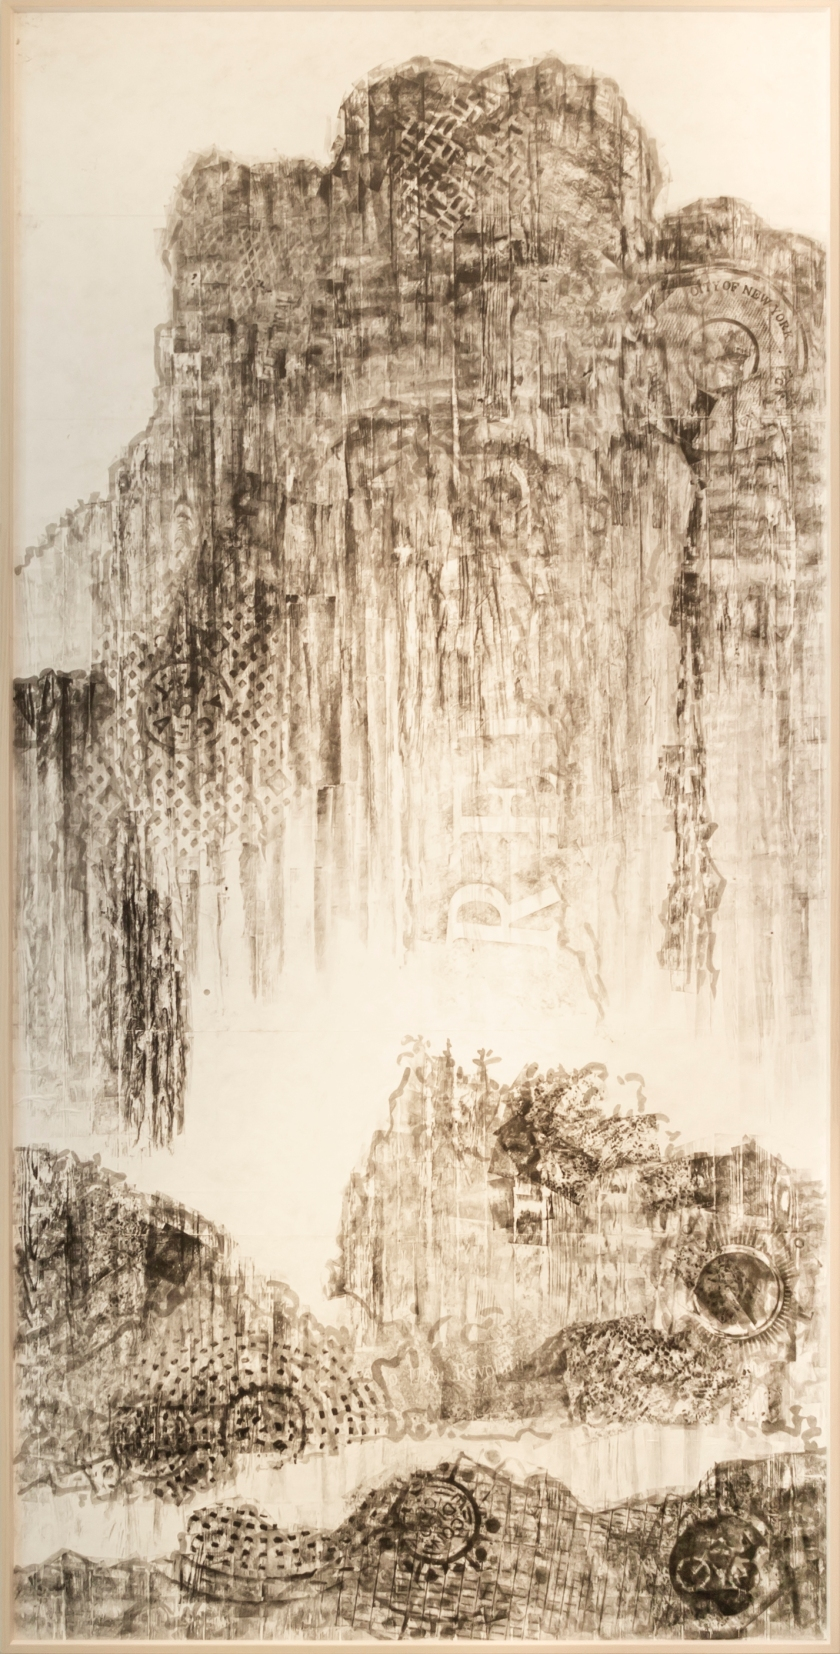 2012_韓湘寧 HAN Hsiang Ning 行旅圖-紐約 Travelers Among Mountains and Streams:New York 2012 油墨、滾筒拓印、聚乙烯纖維紙 Oil ink roller rubbing on tyvek paper 484.4x242cm